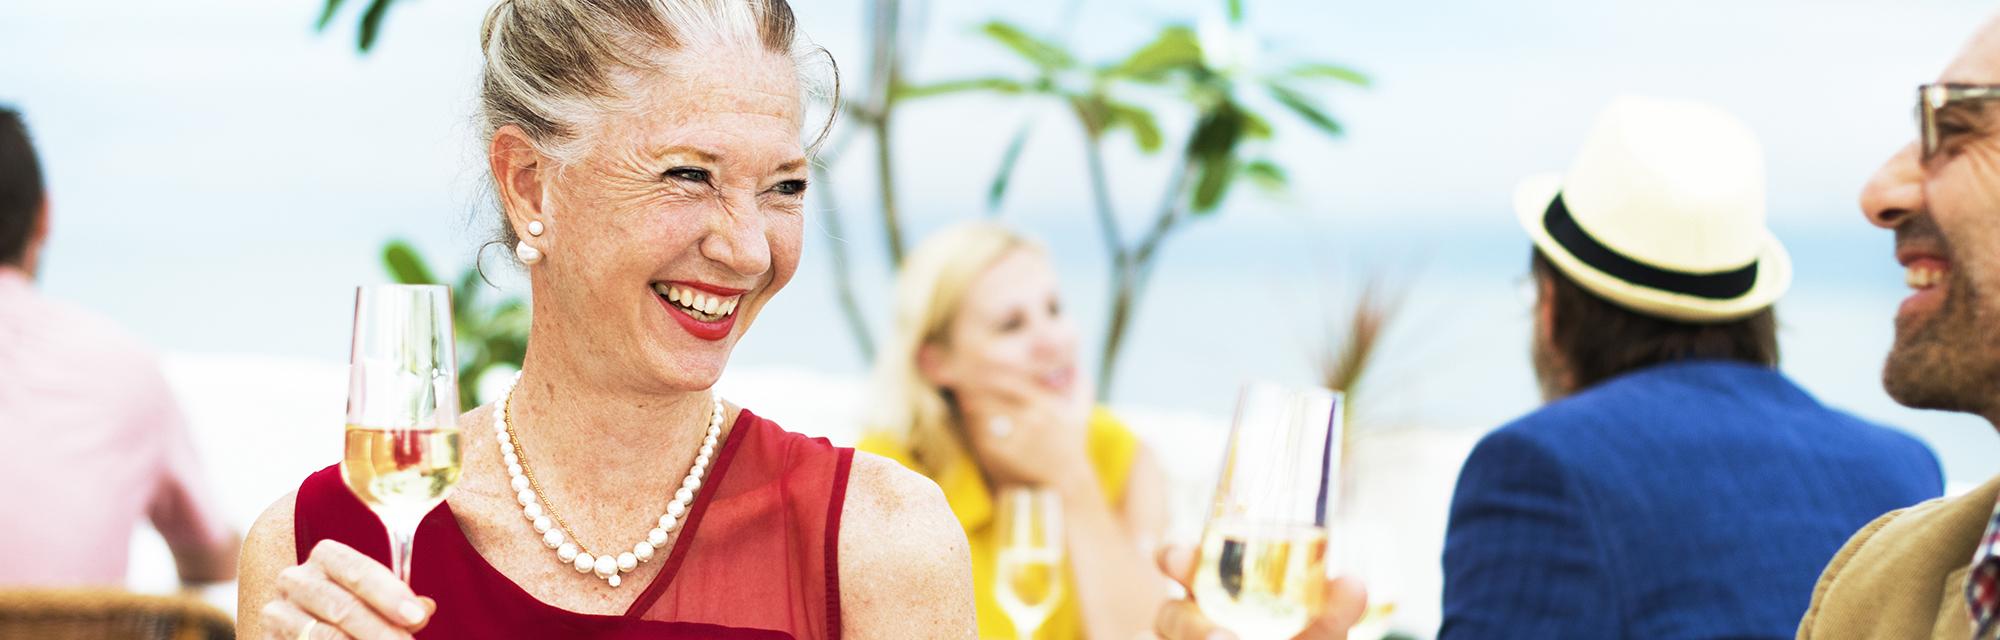 Independent Senior Living in Boca Raton FL Sinai Residences